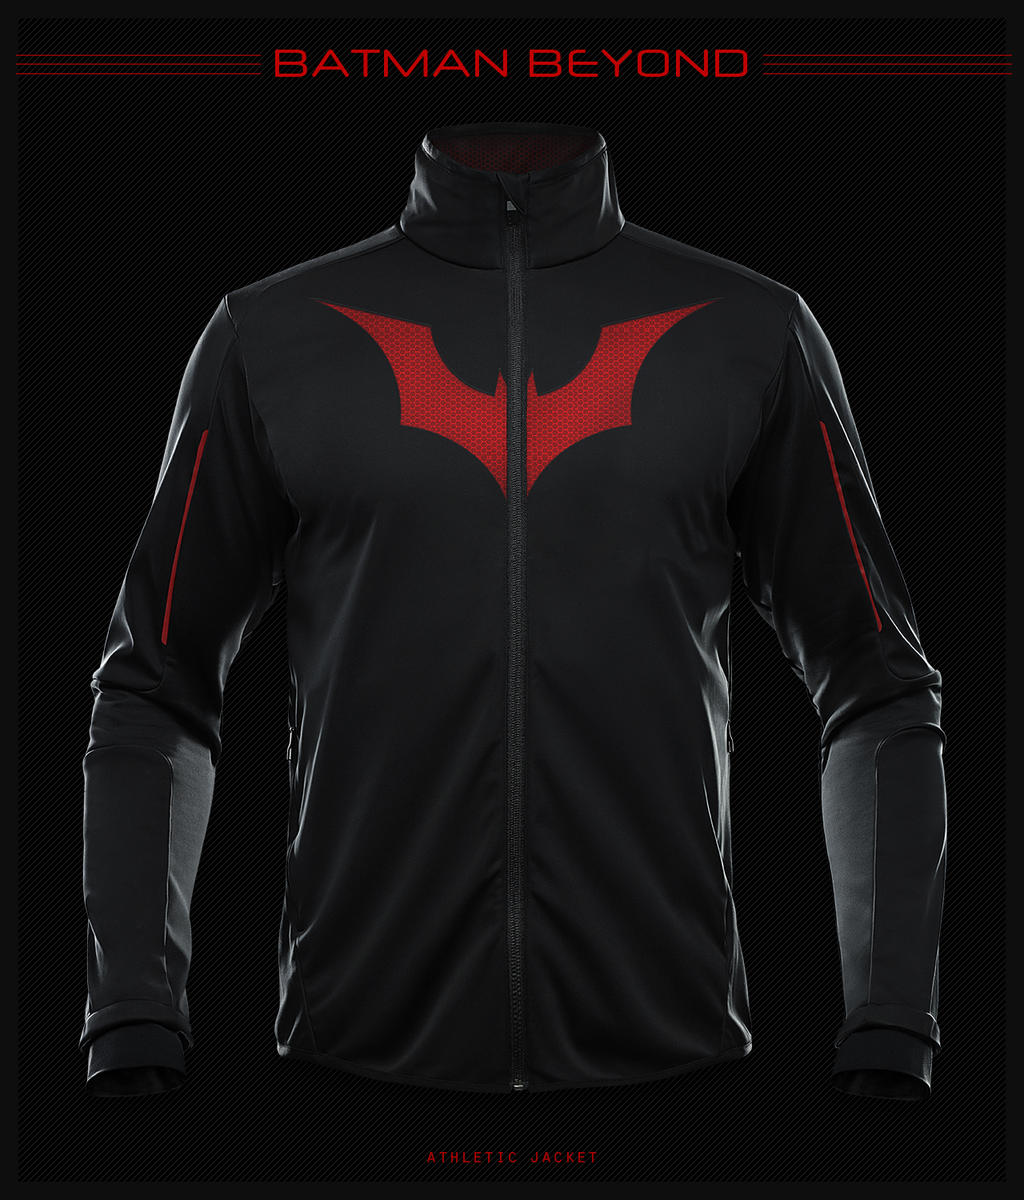 Batman Beyond Jacket by seventhirtytwo